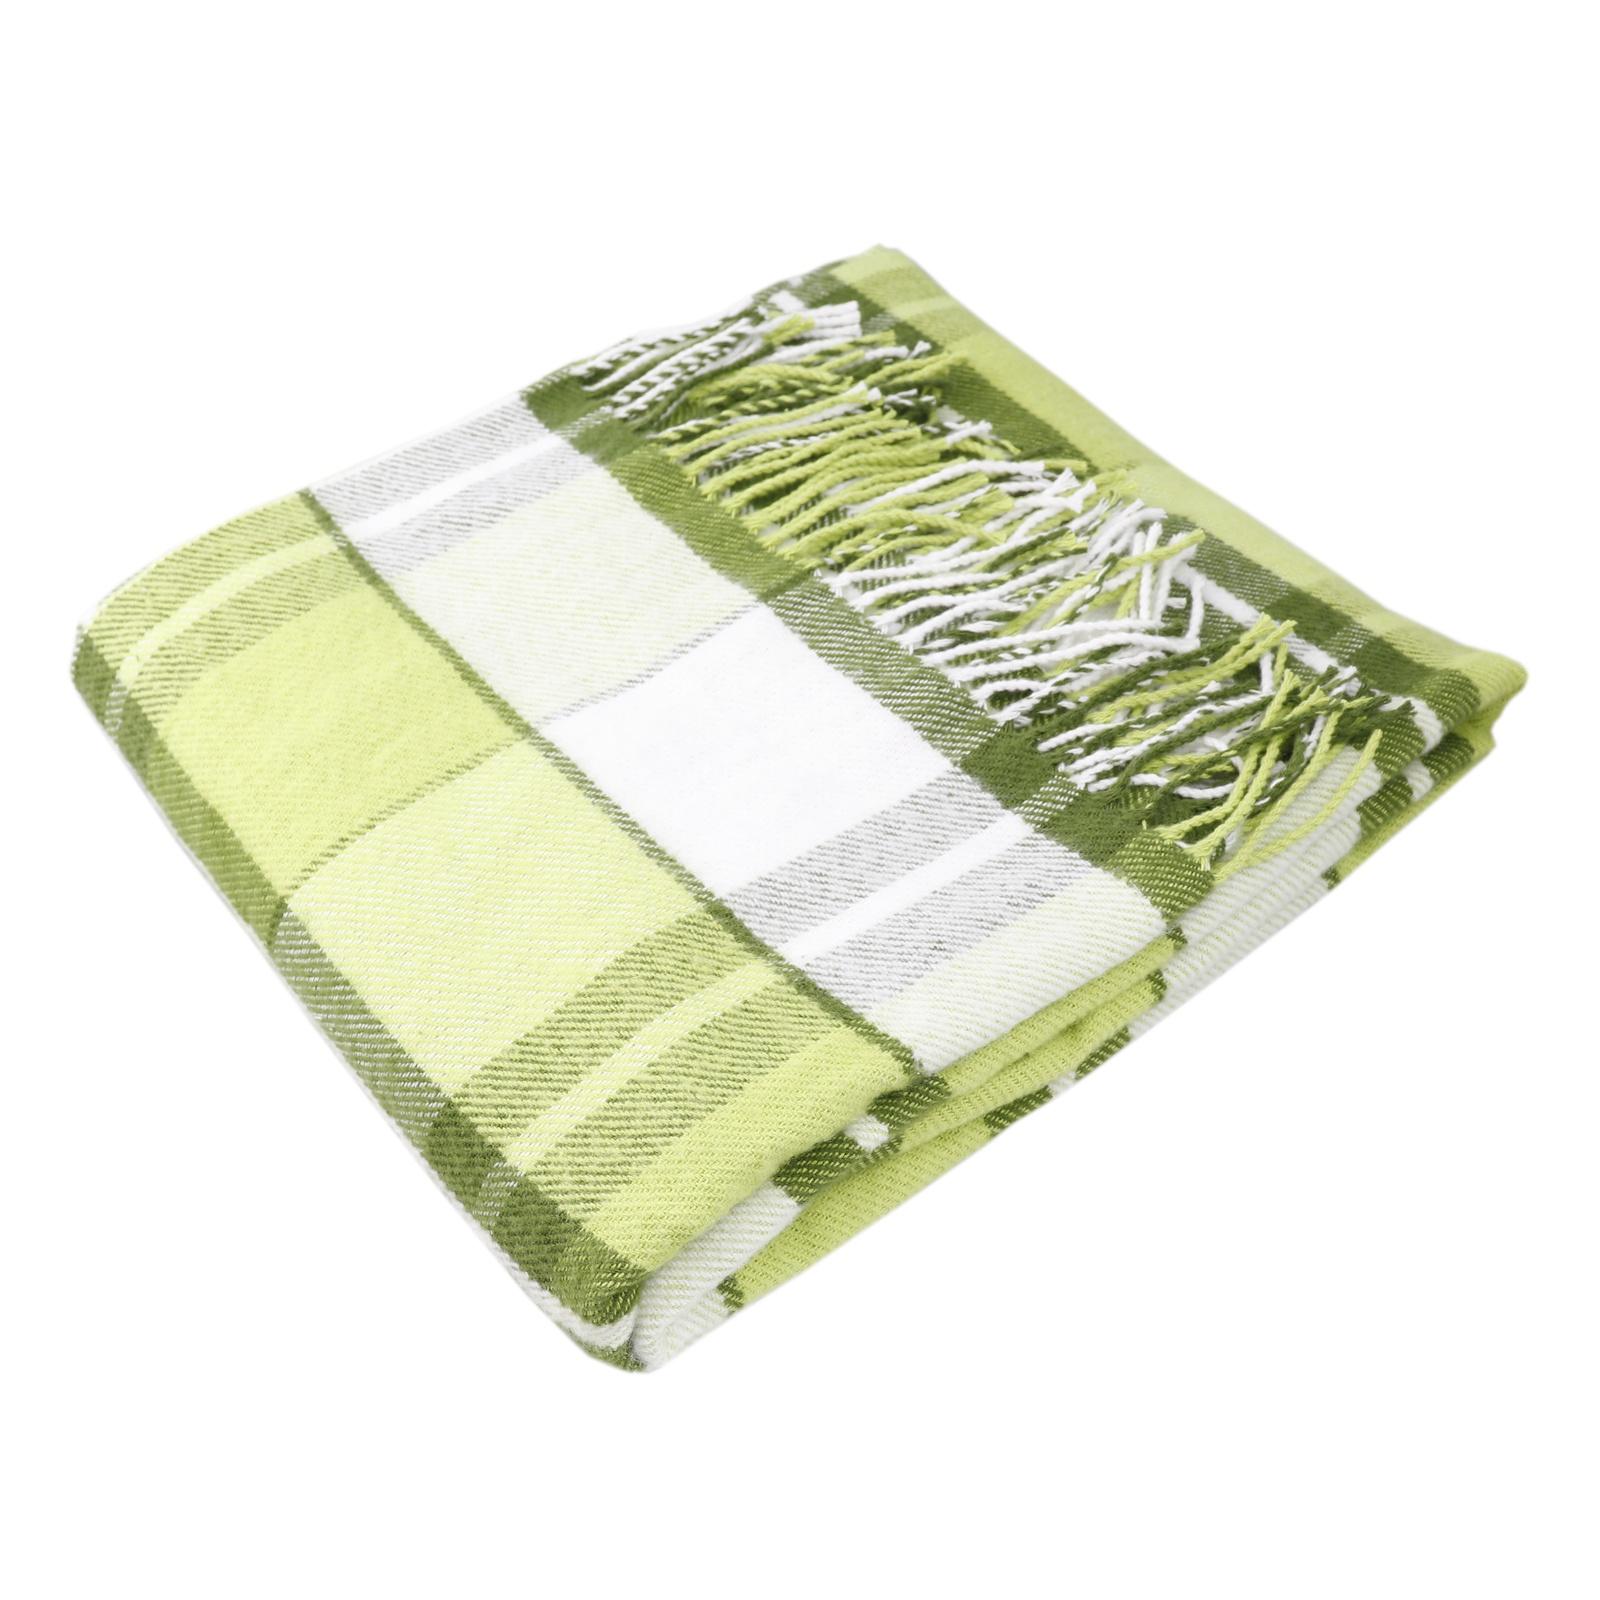 Фото - Плед ARLONI хлоп в клет Эдинбург светл-зелен 140*200 плед arloni плед покрывало кокос олива 100% хлопок 140 200 хлопок